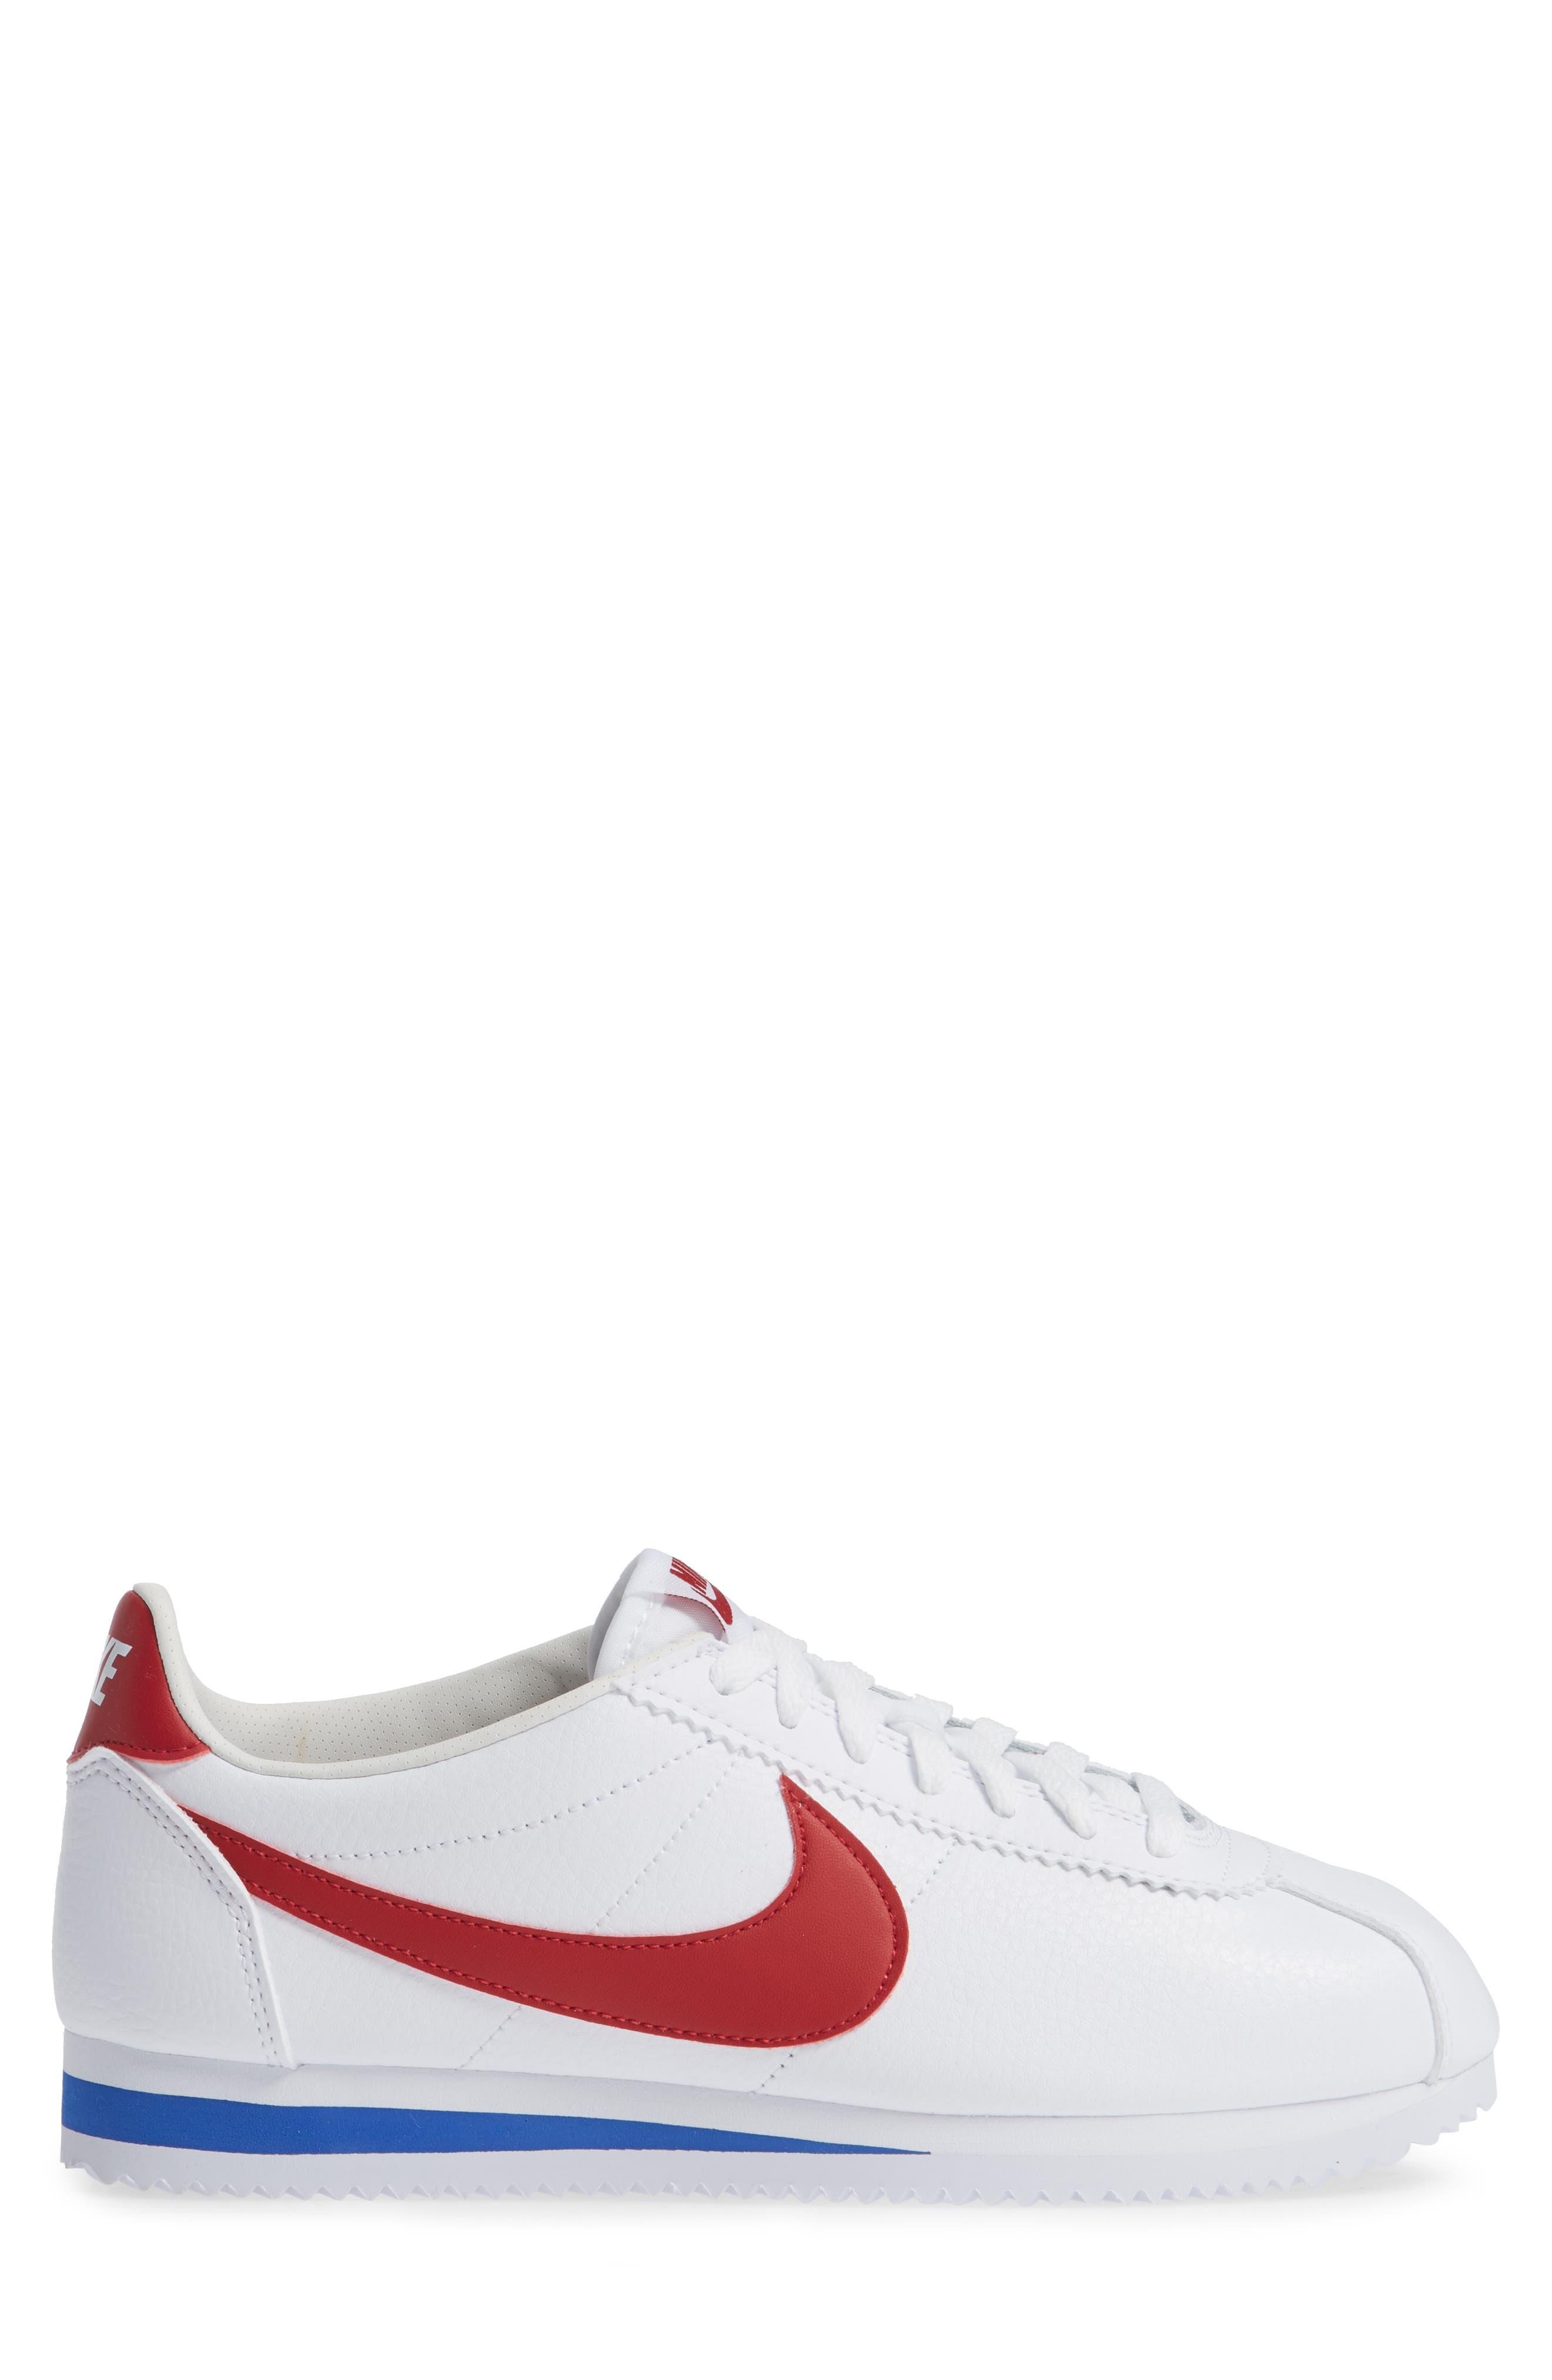 Classic Cortez Sneaker,                             Alternate thumbnail 4, color,                             White/ Varsity Red/ Royal